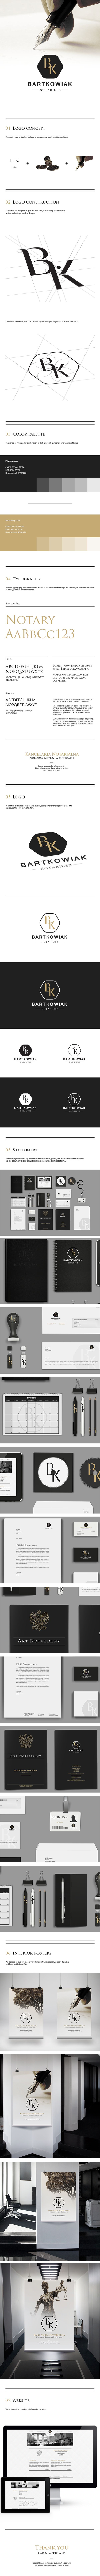 #branding #identity #corporateidentity